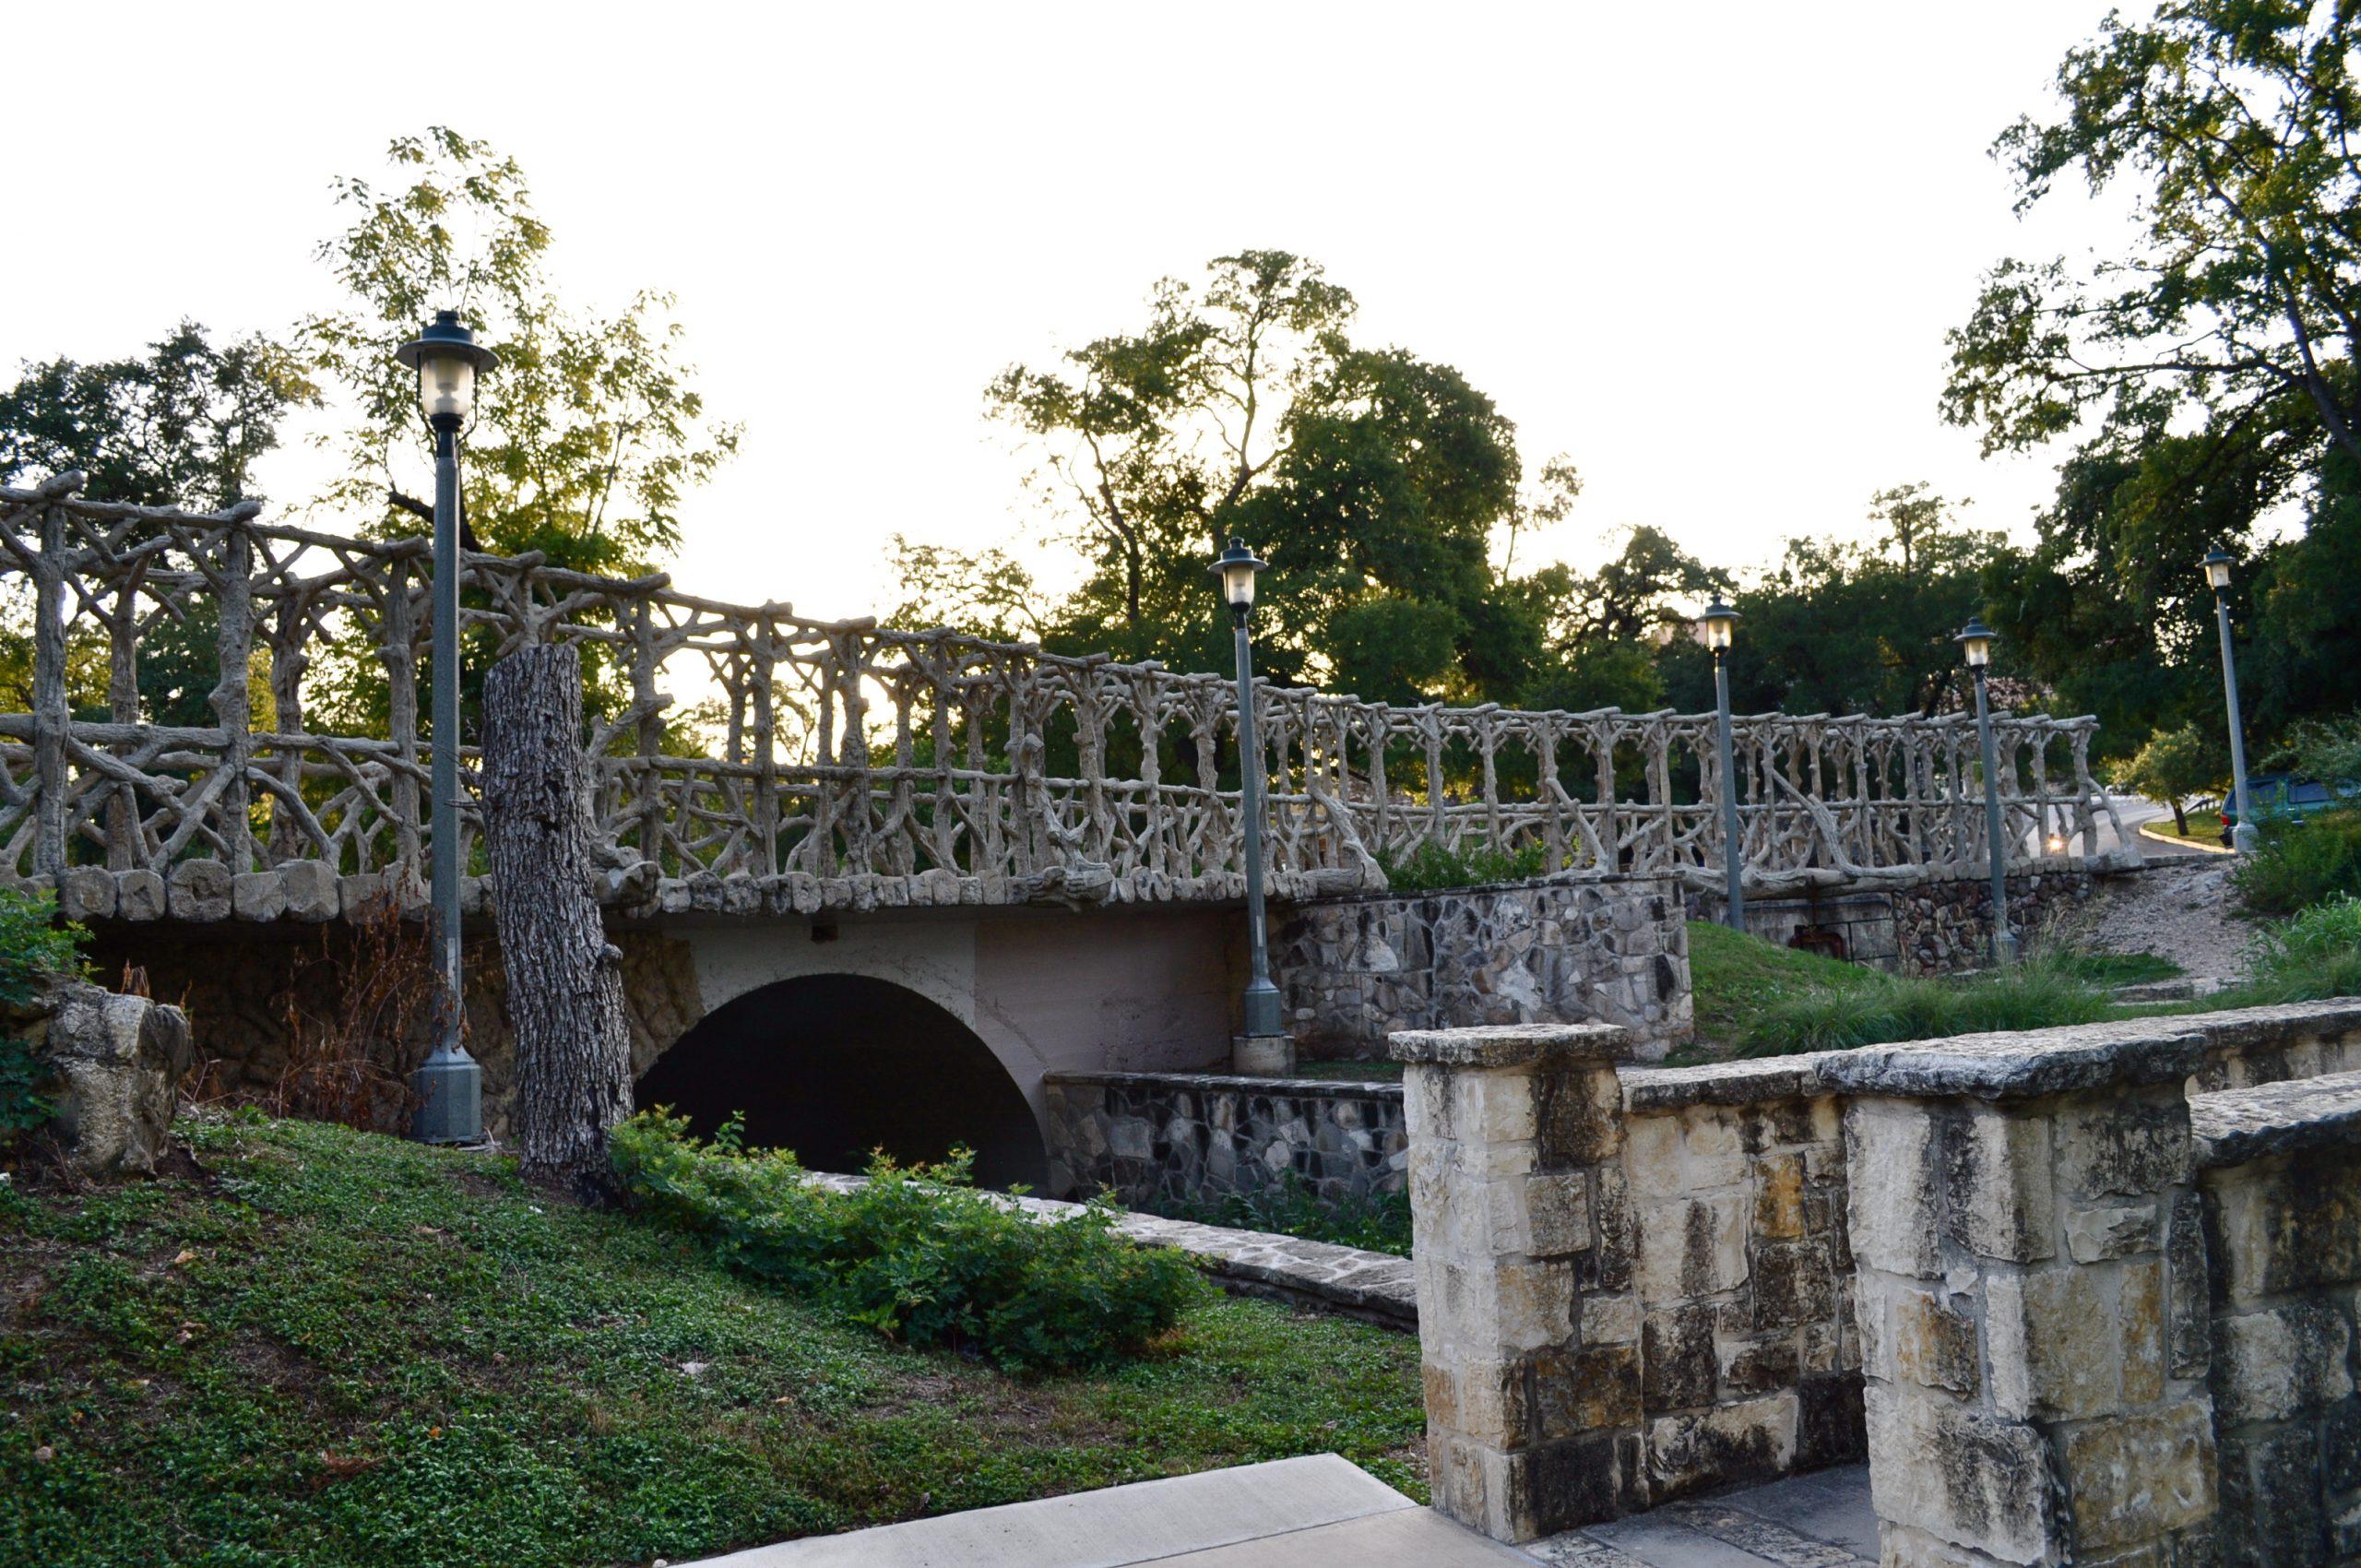 Faux bois footbridge in Brackenridge Park sculpted by Dionicio Rodriguez. Photo by Iris Dimmick.